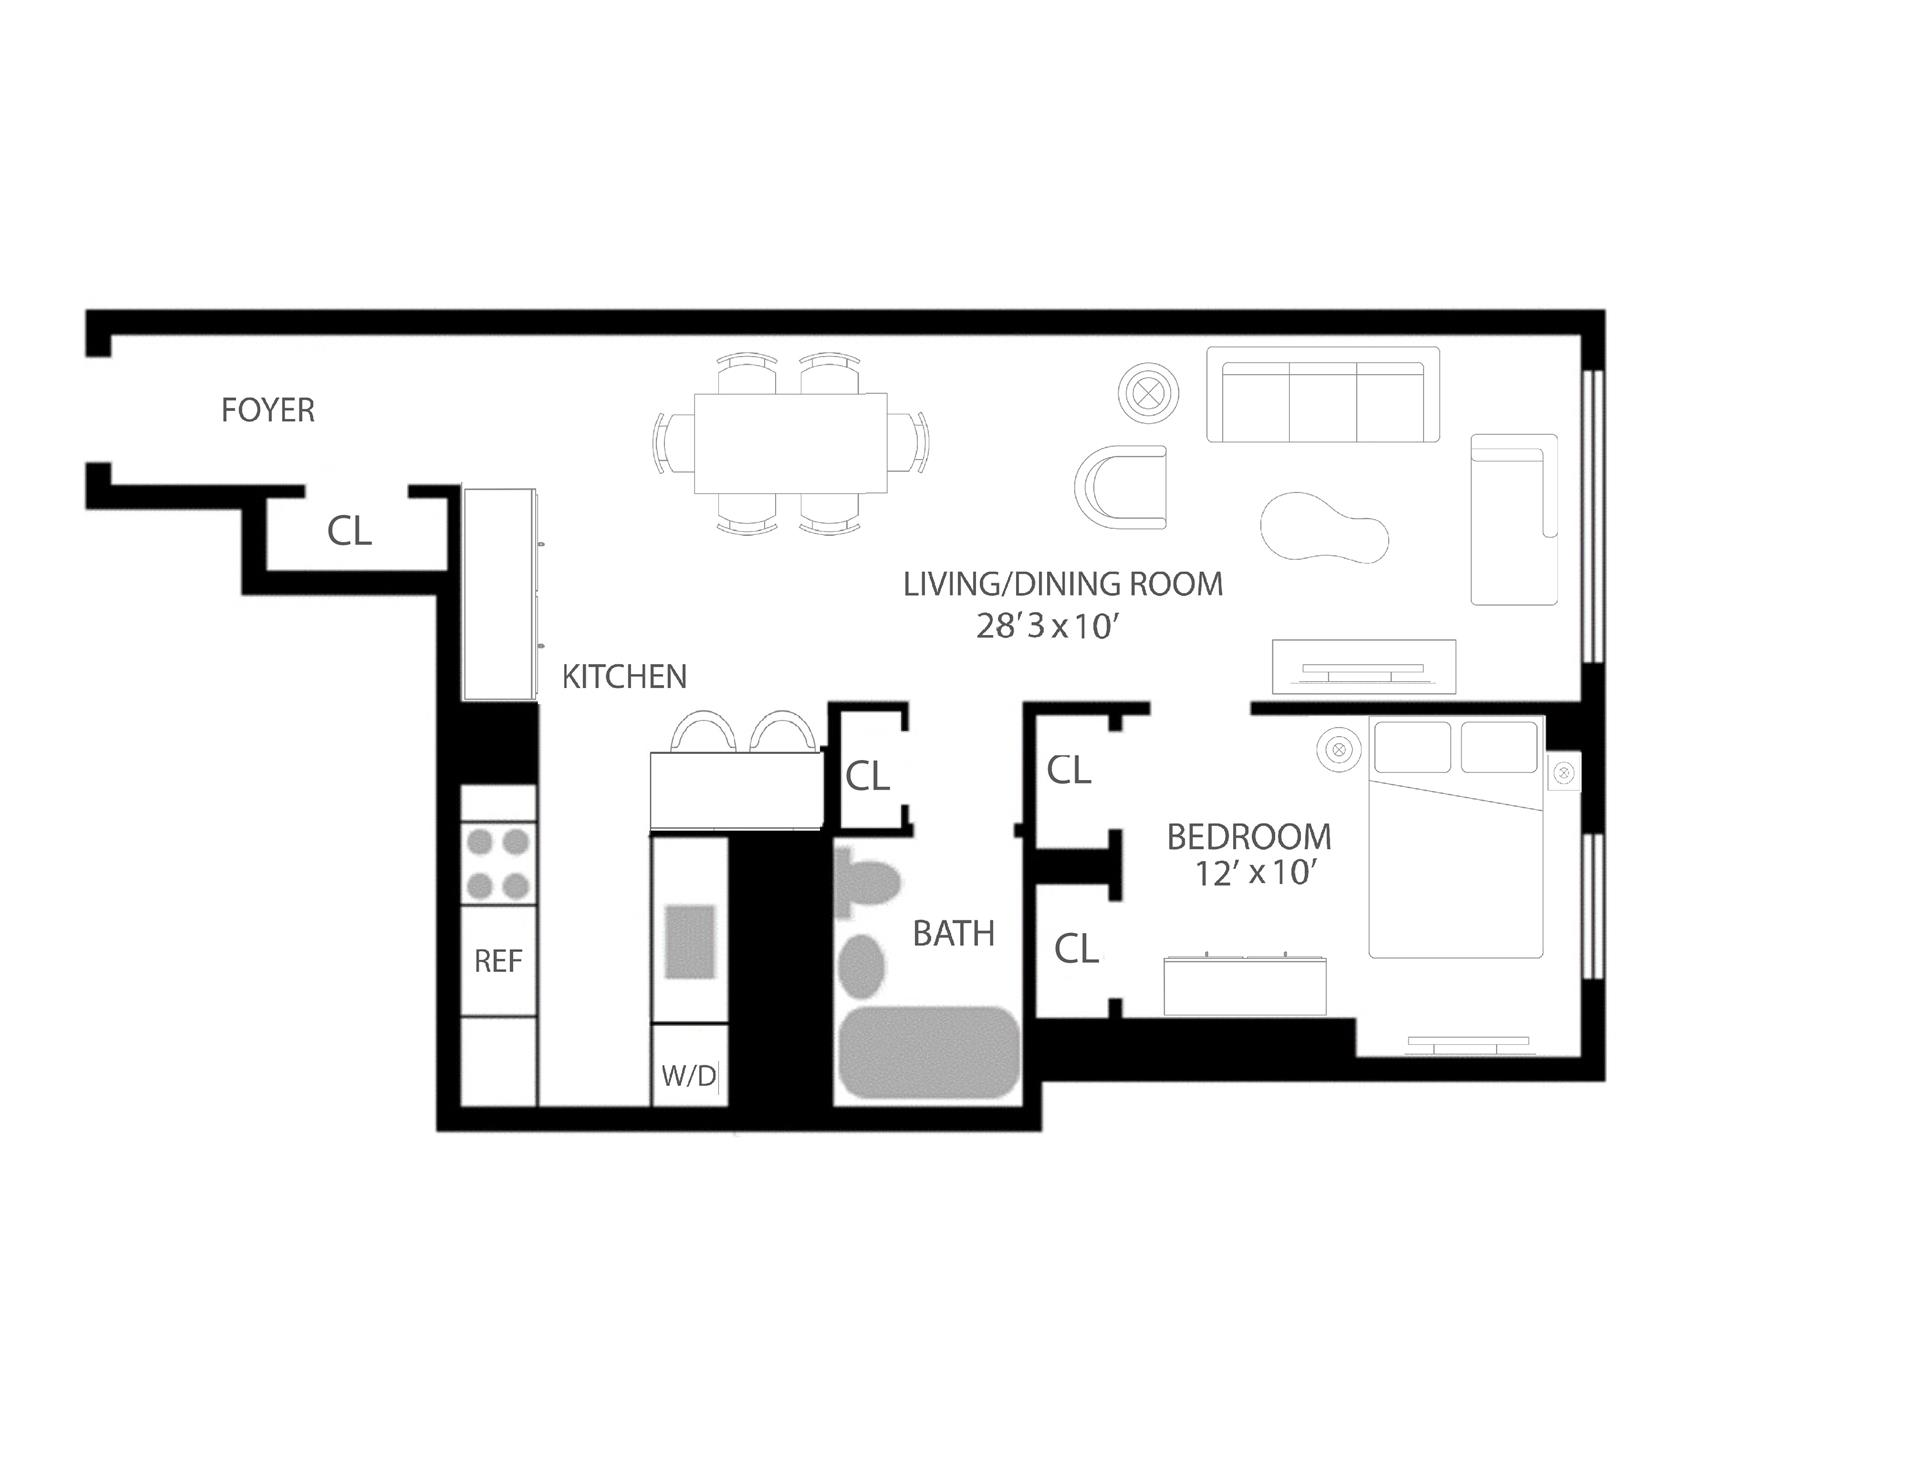 Floor plan of THE ALBERT, 23 East 10th St, 5D - Greenwich Village, New York